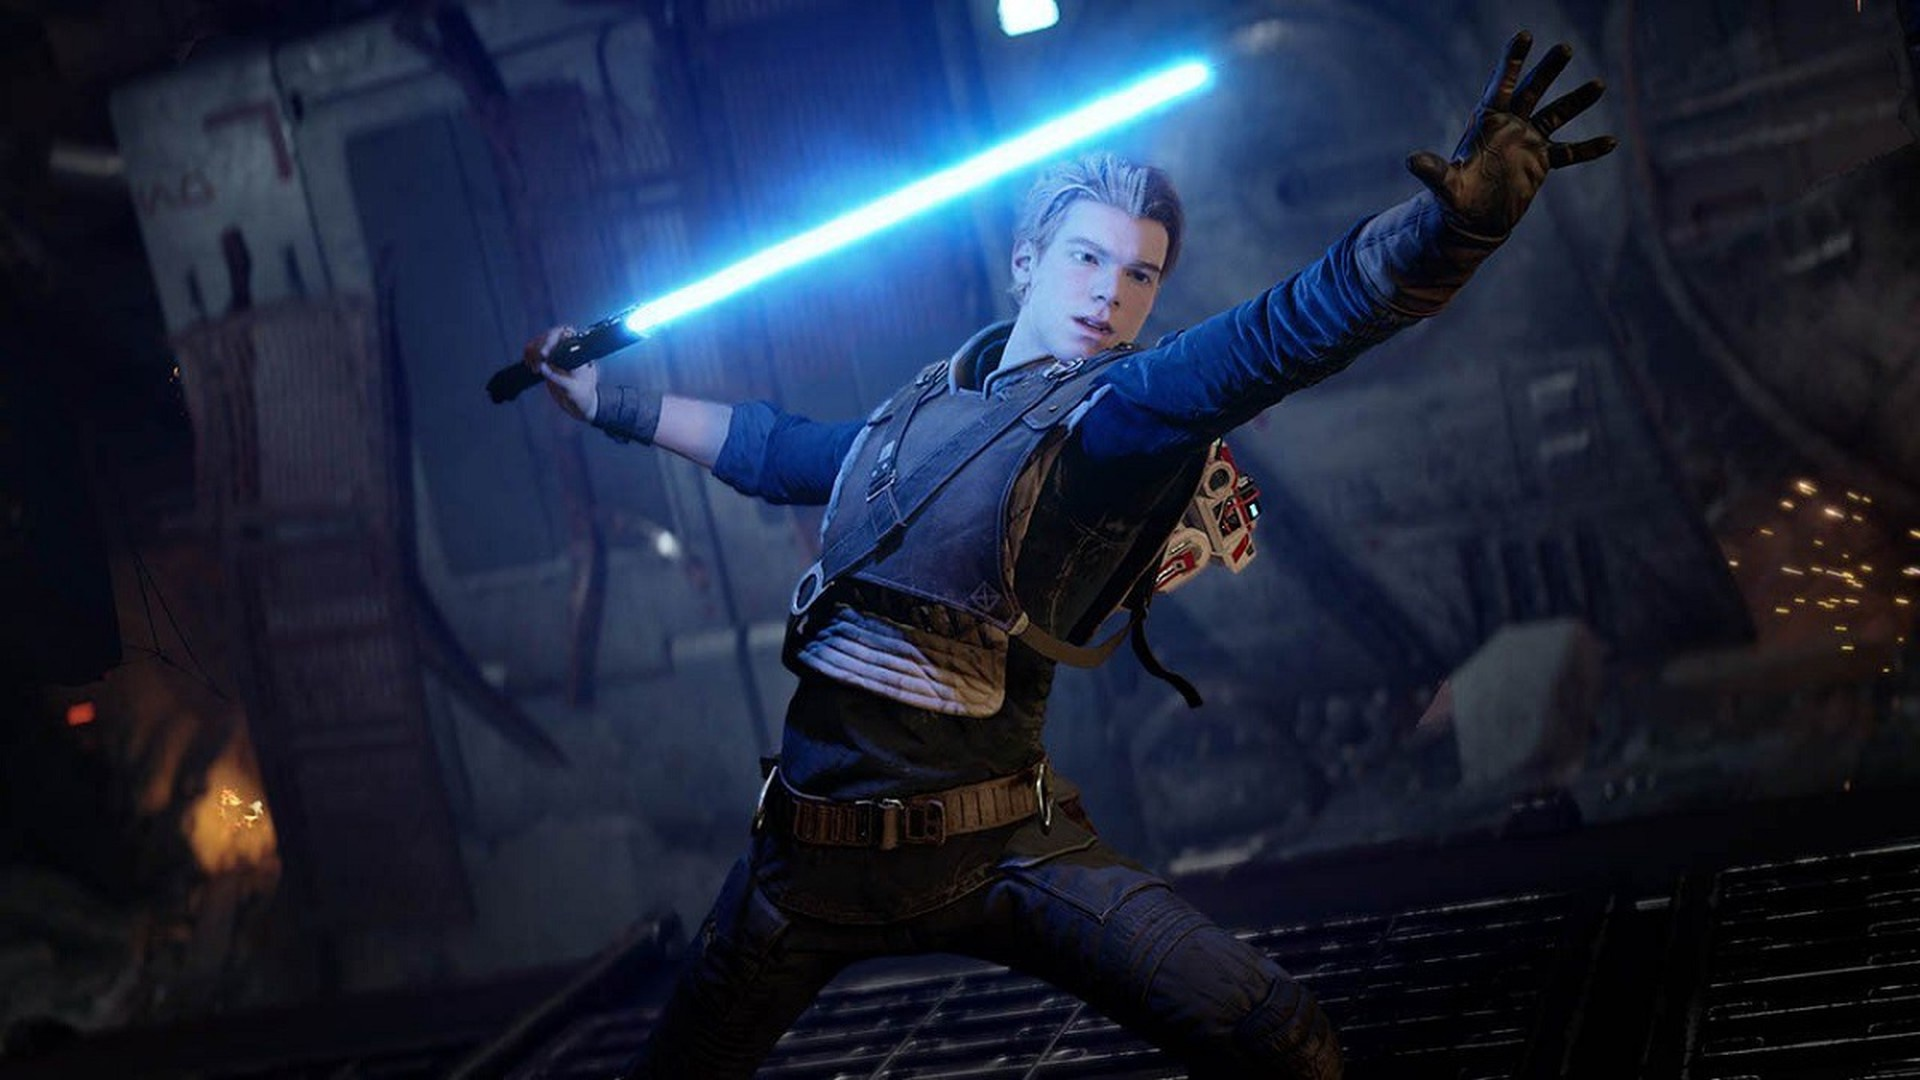 Концепт-арты Star Wars Jedi: Fallen Order: от Второй сестры до дроида BD-1